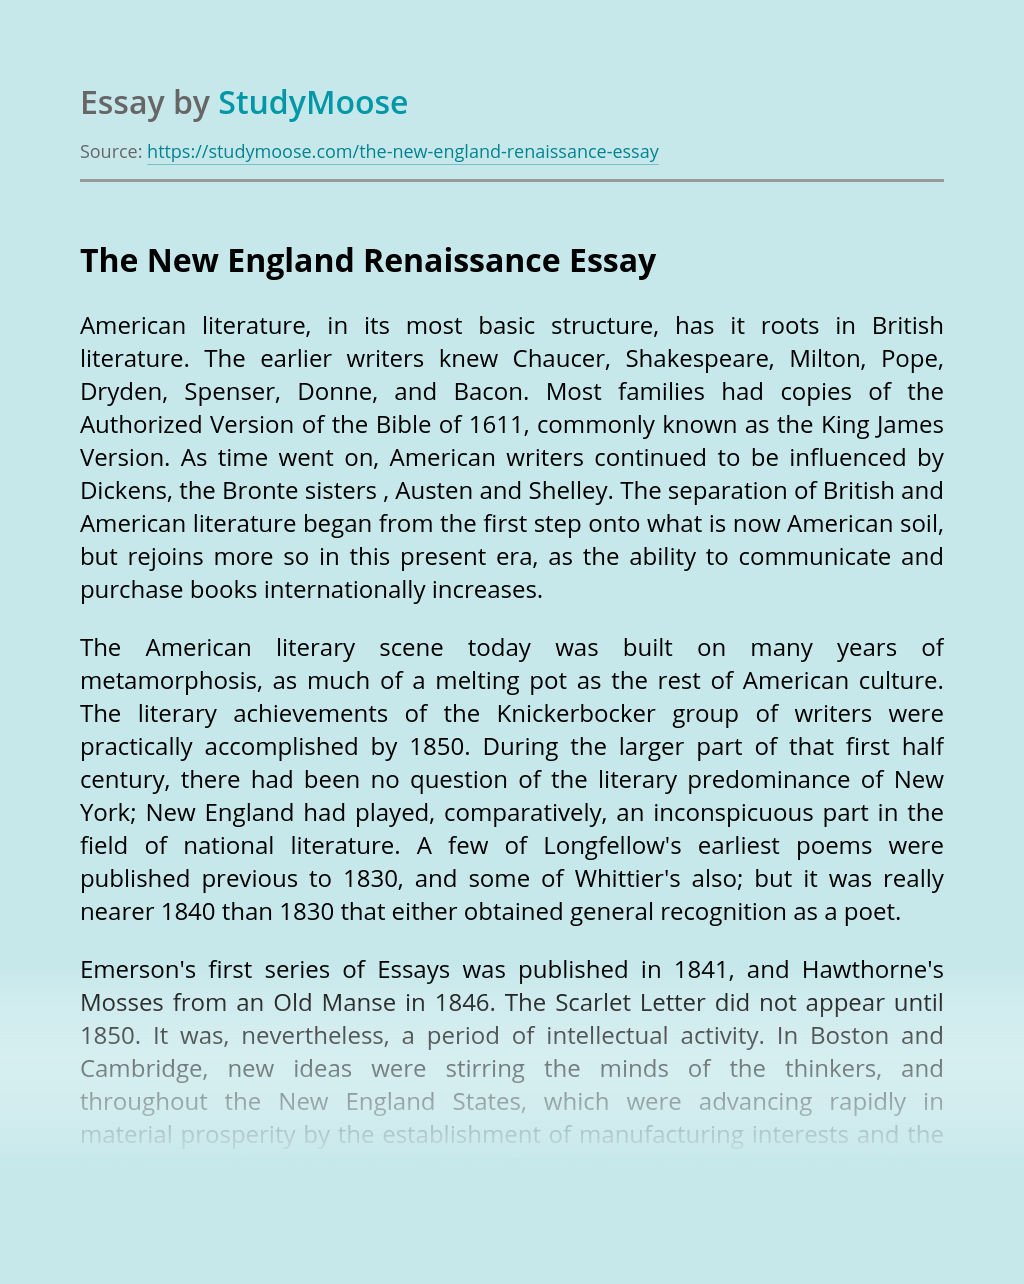 The New England Renaissance